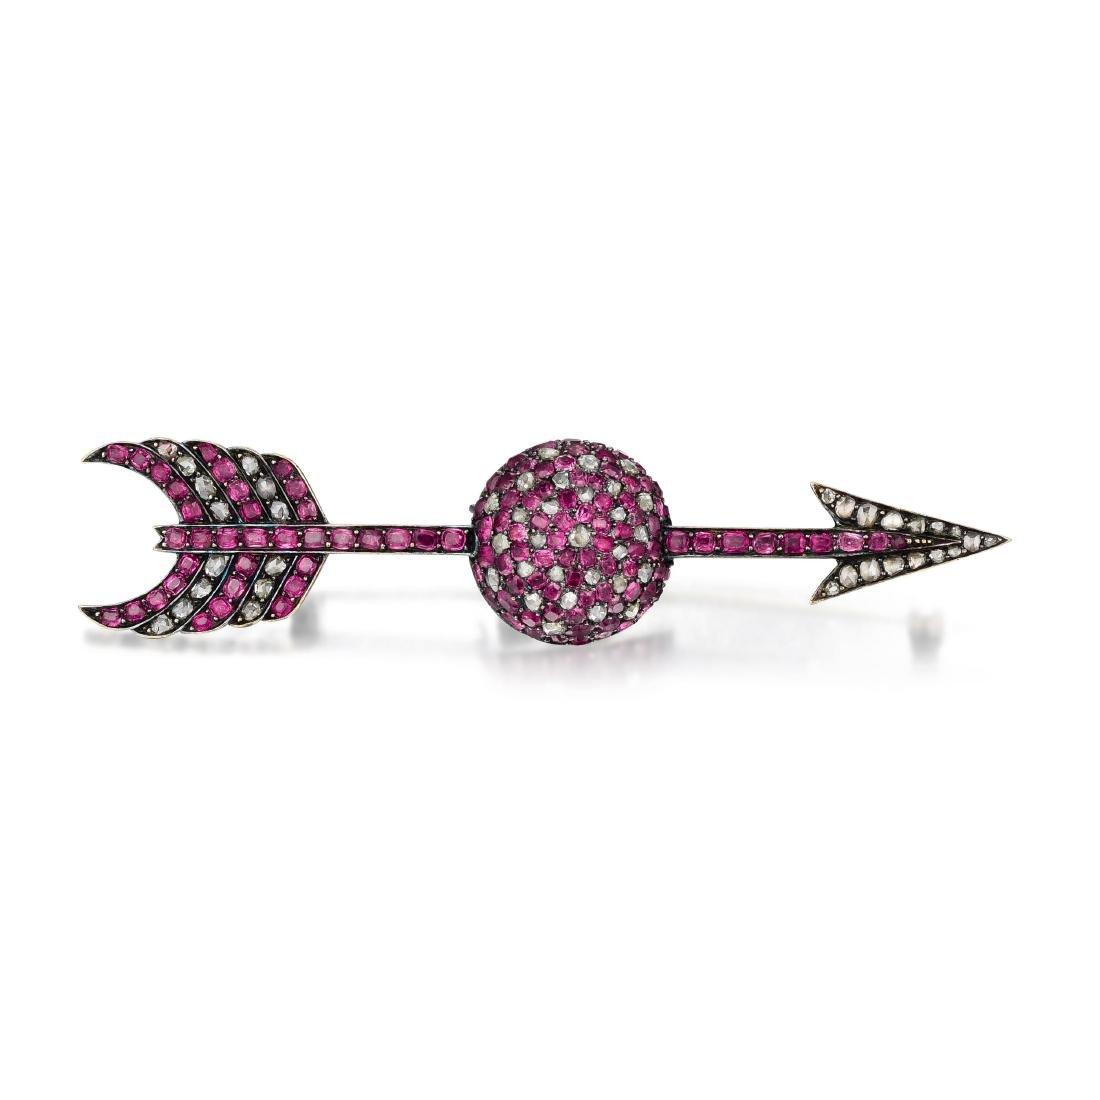 A Ruby and Diamond Arrow Brooch, French